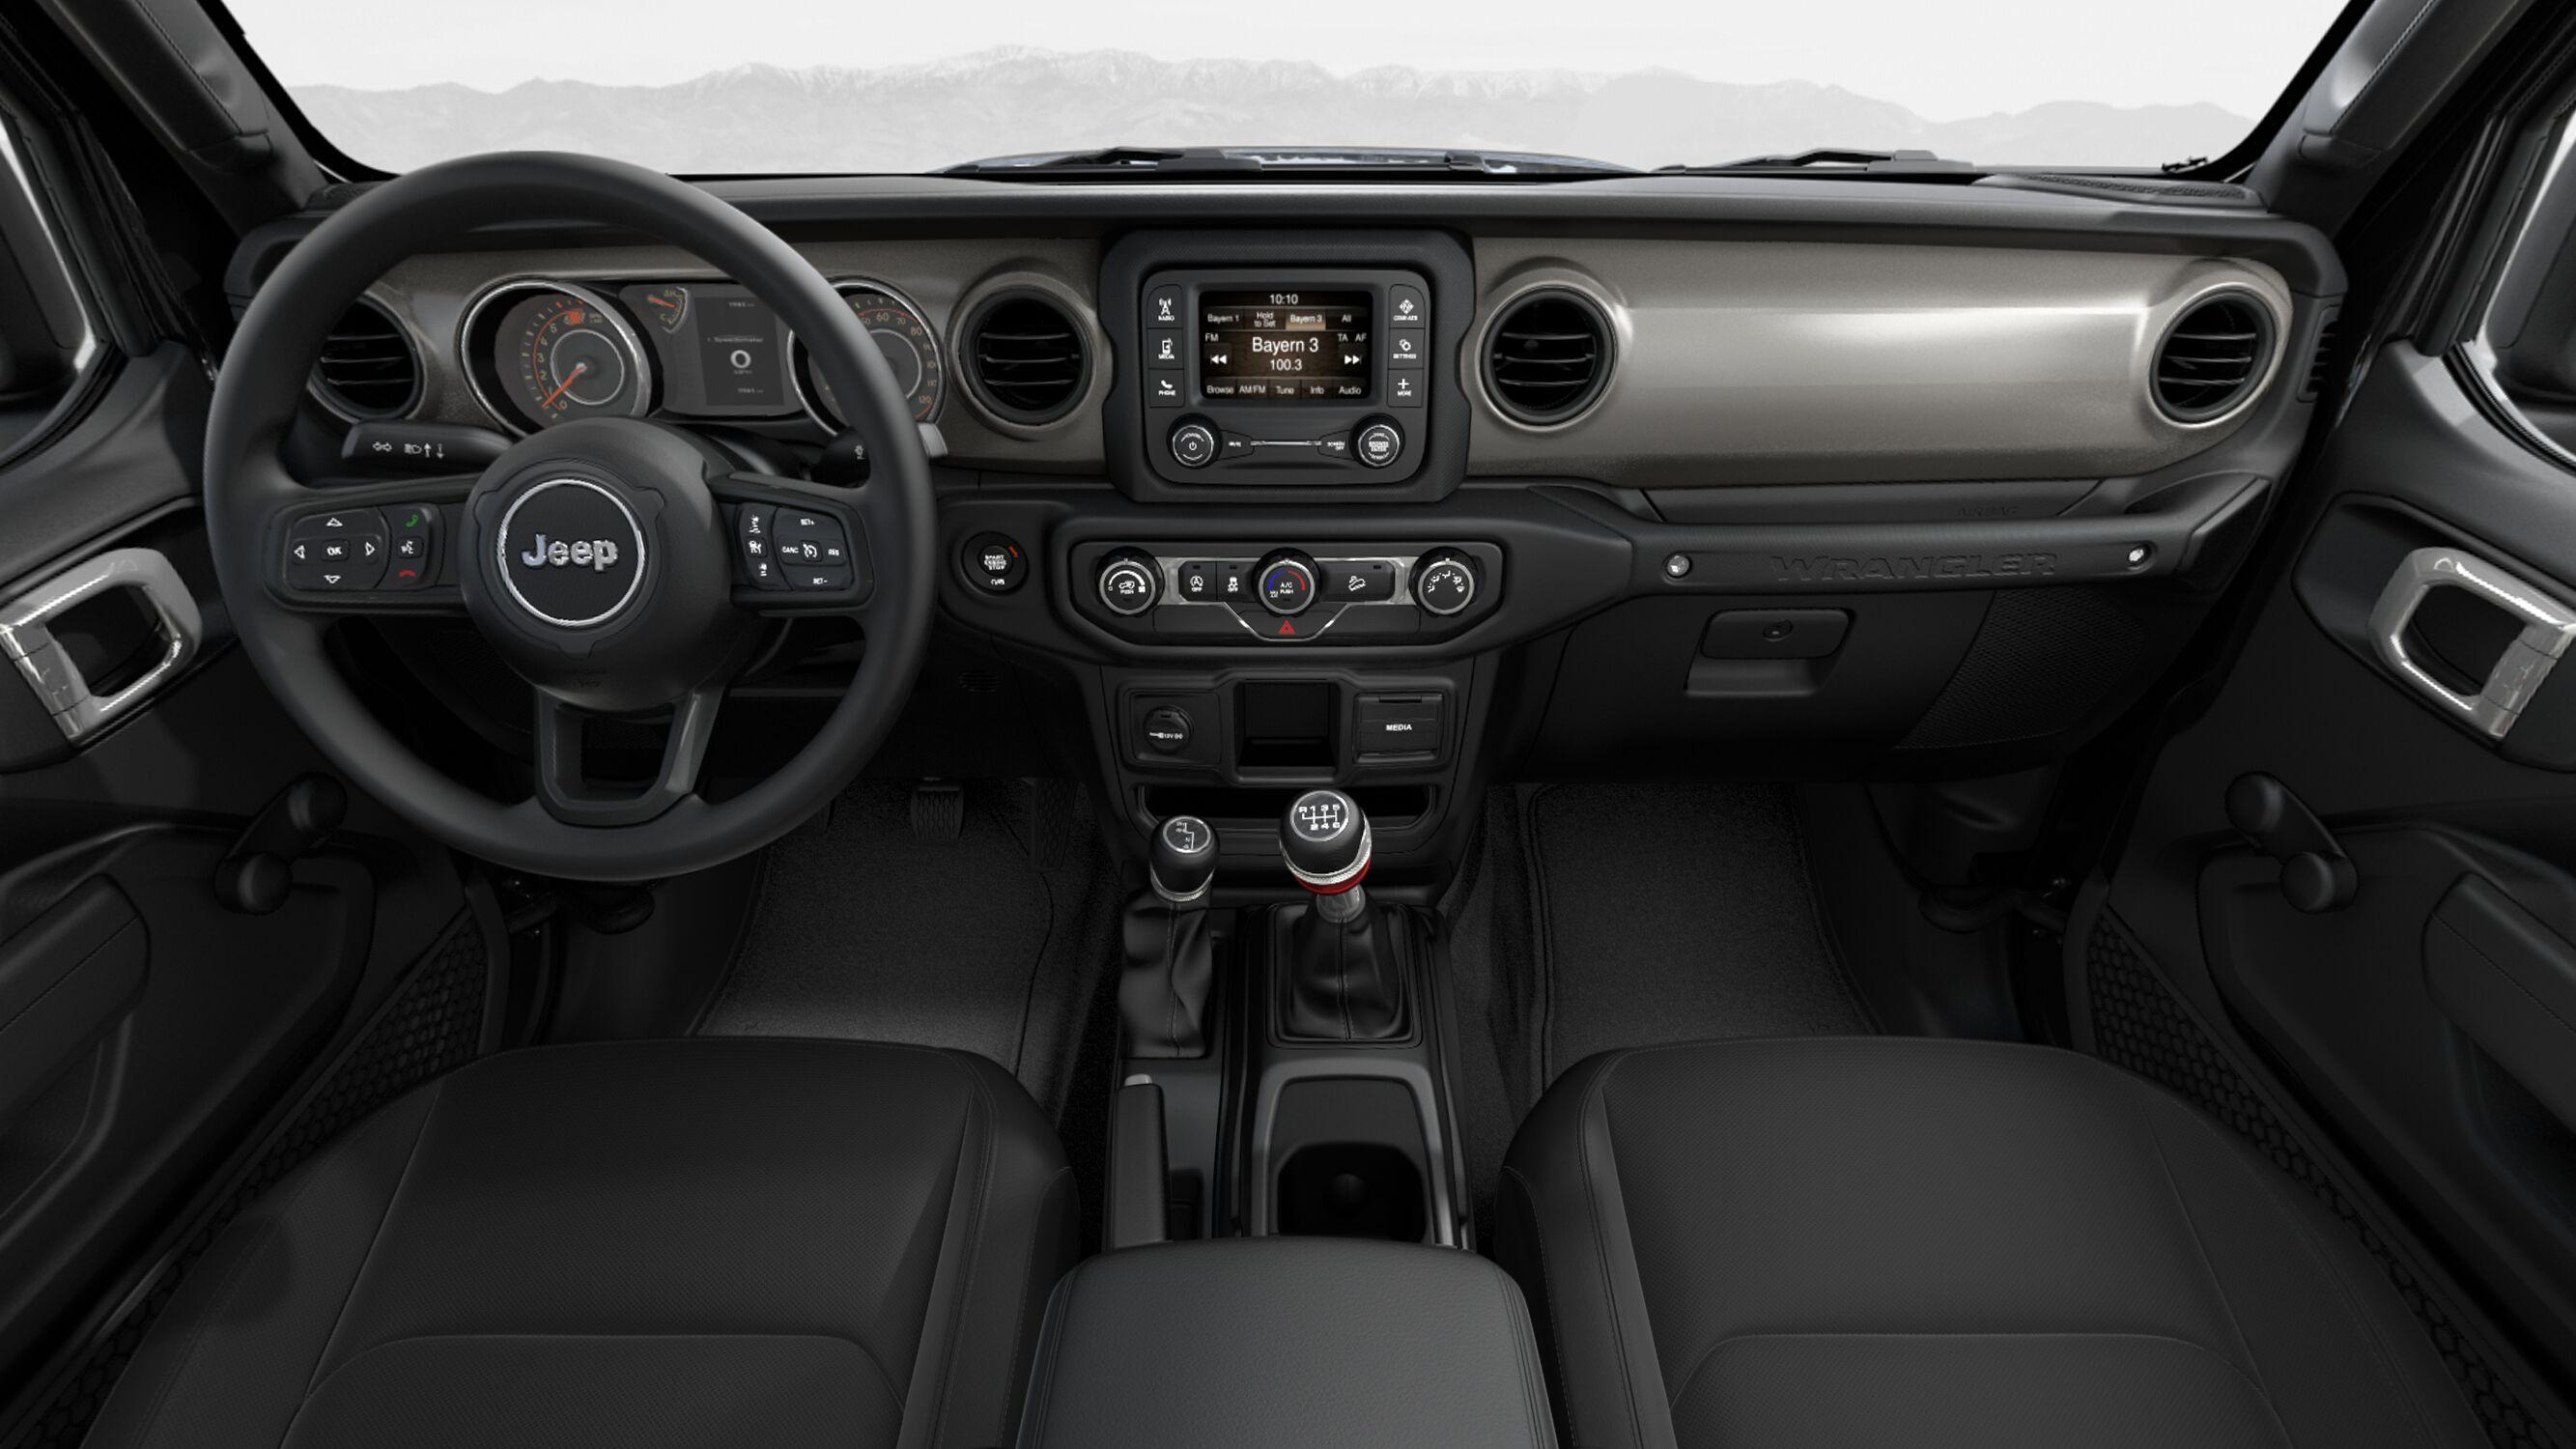 2019 Jeep Wrangler Unlimited Sport | Rainbow Chrysler ...